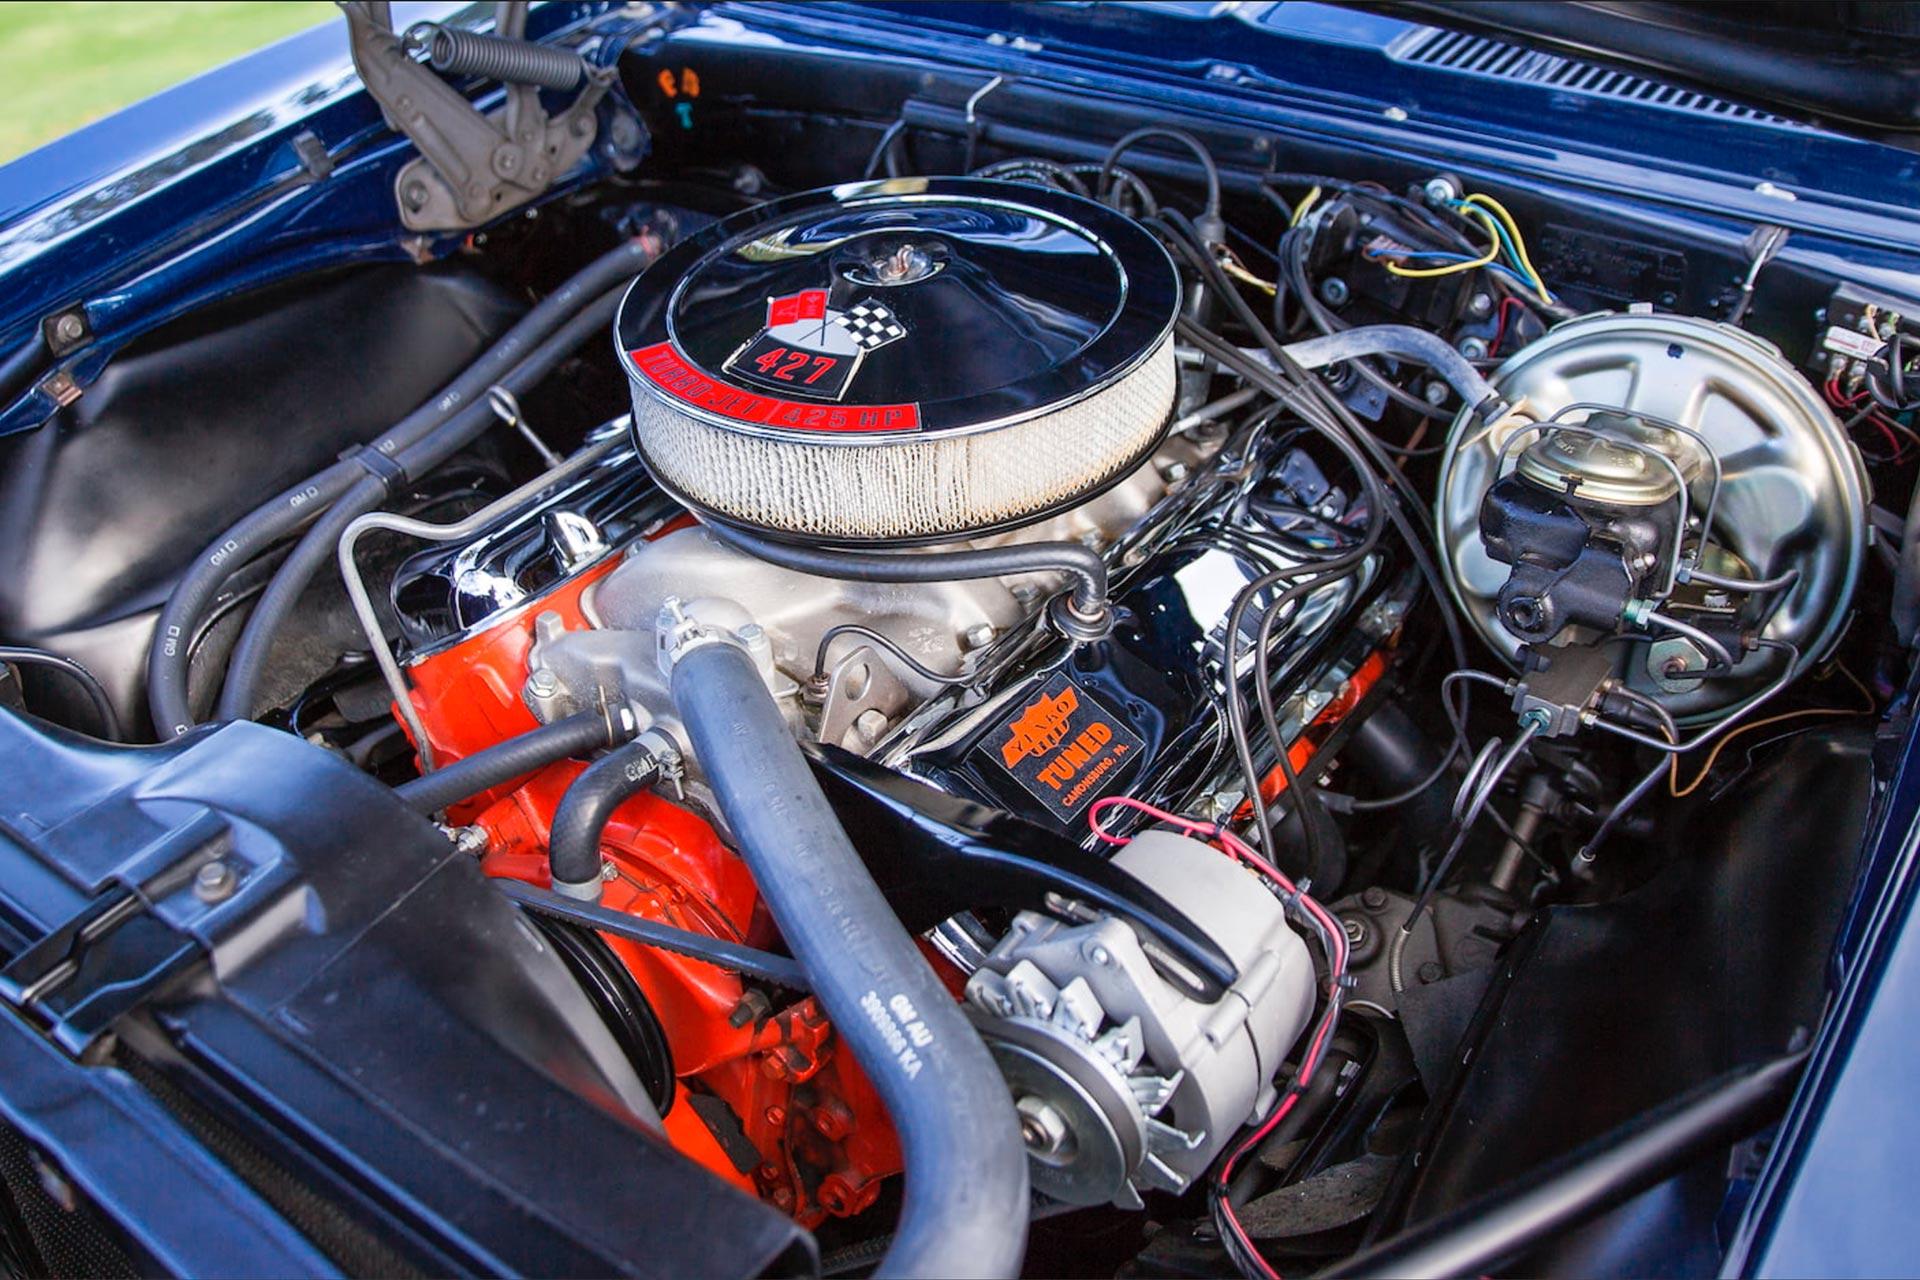 427 TurboJet 425 hp engine sitting in a 1967 Chevy Yenko Camaro